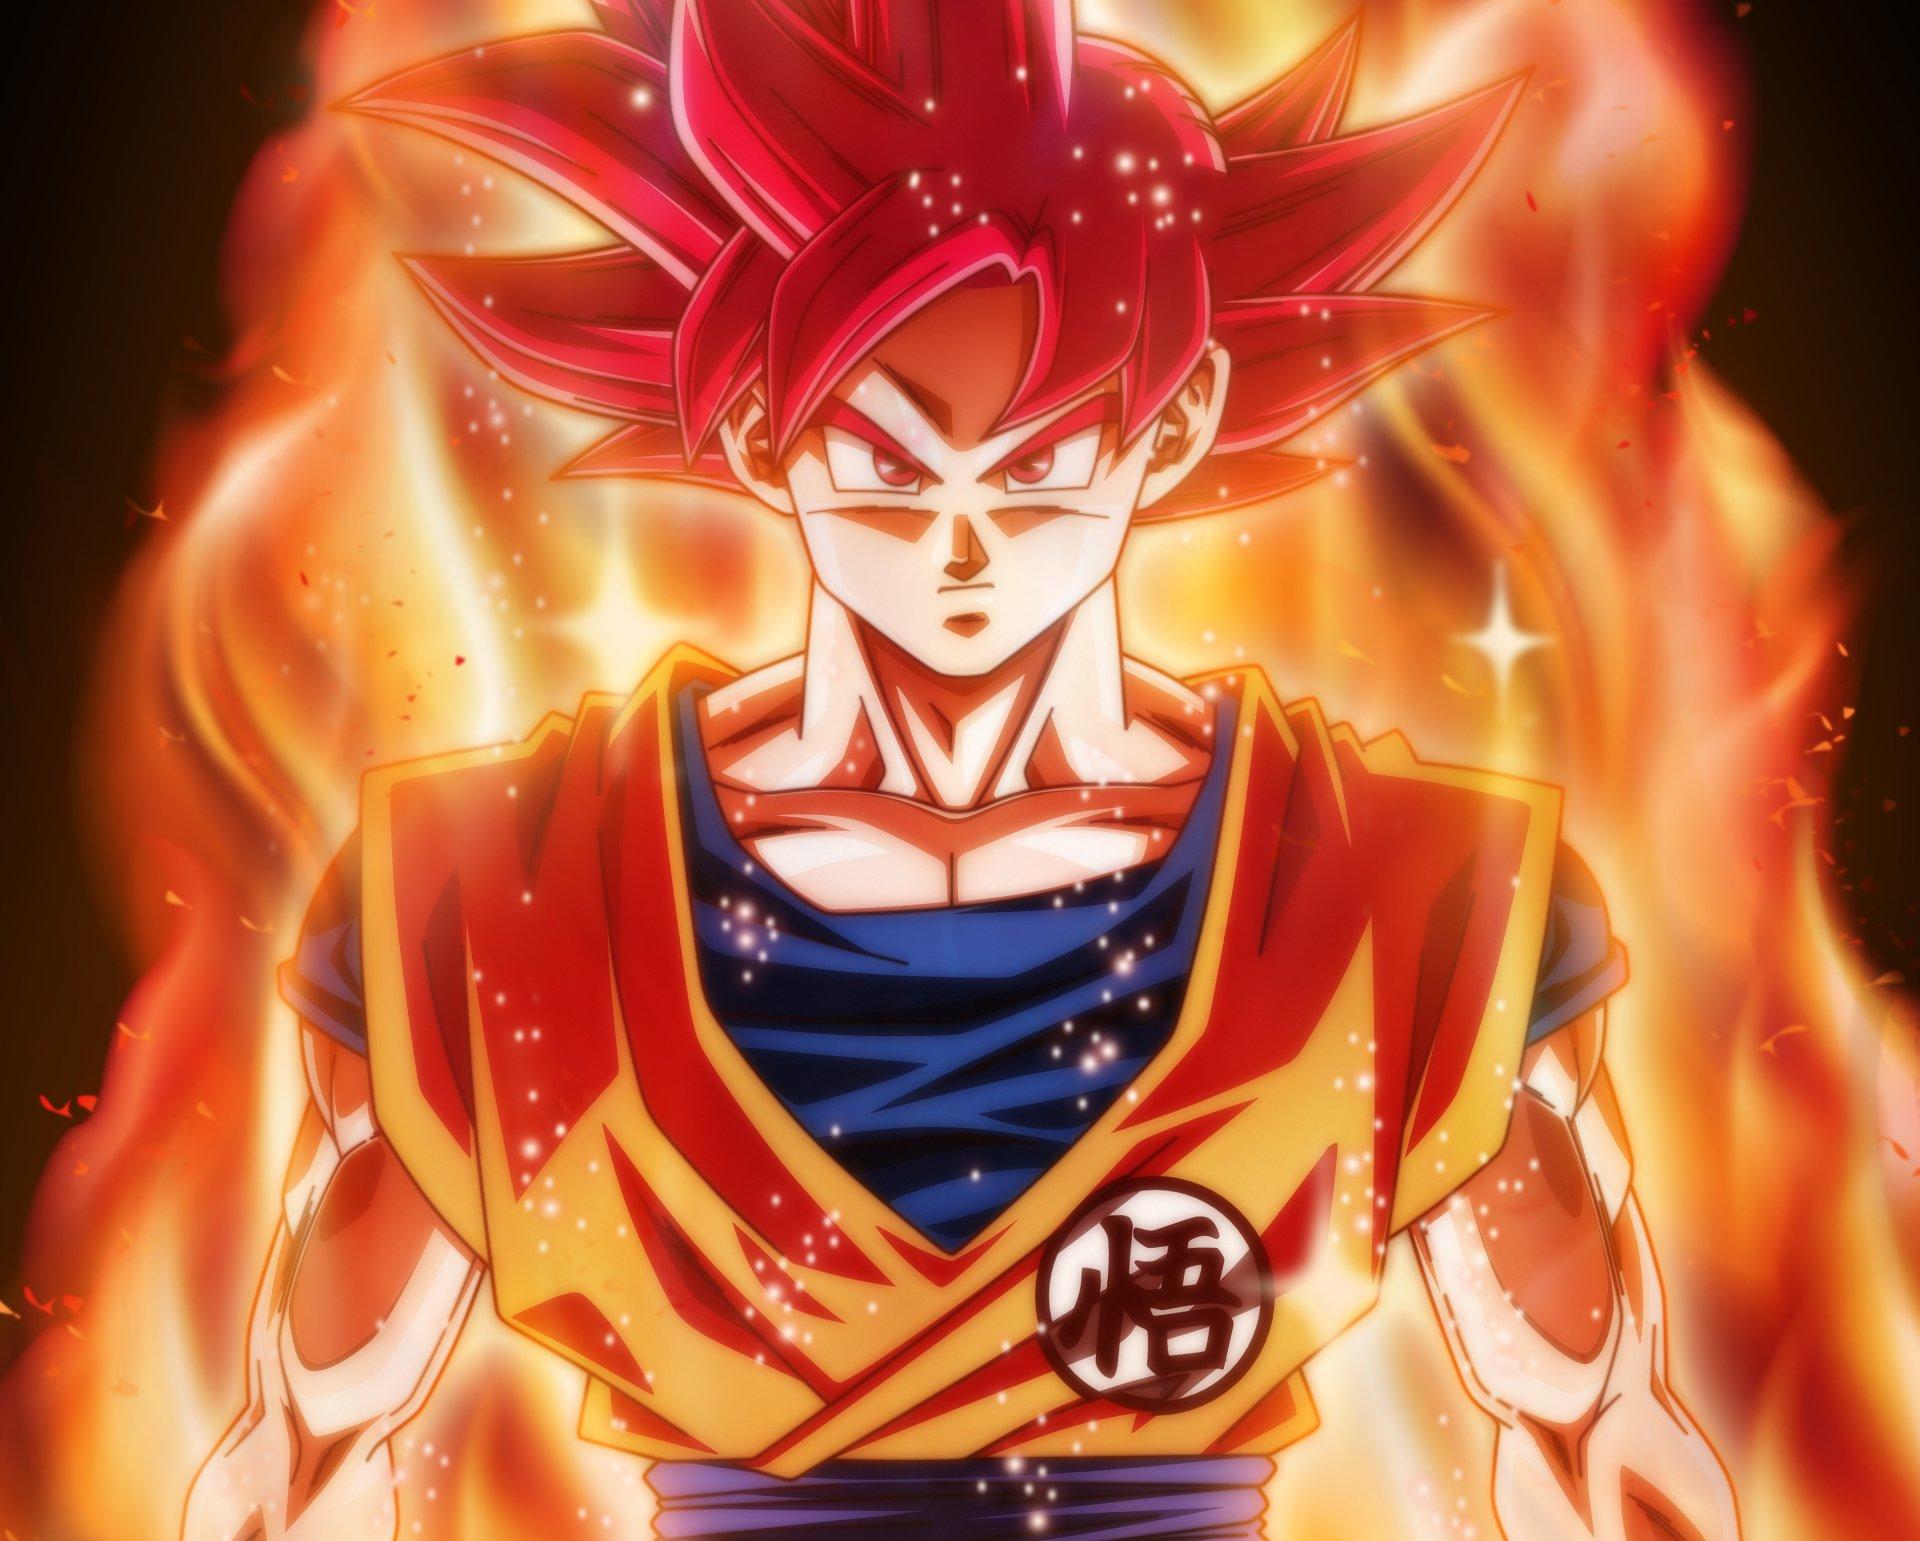 Goku Ssj Dios Para Fondo De Pantalla: Goku God 4k Ultra HD Wallpaper